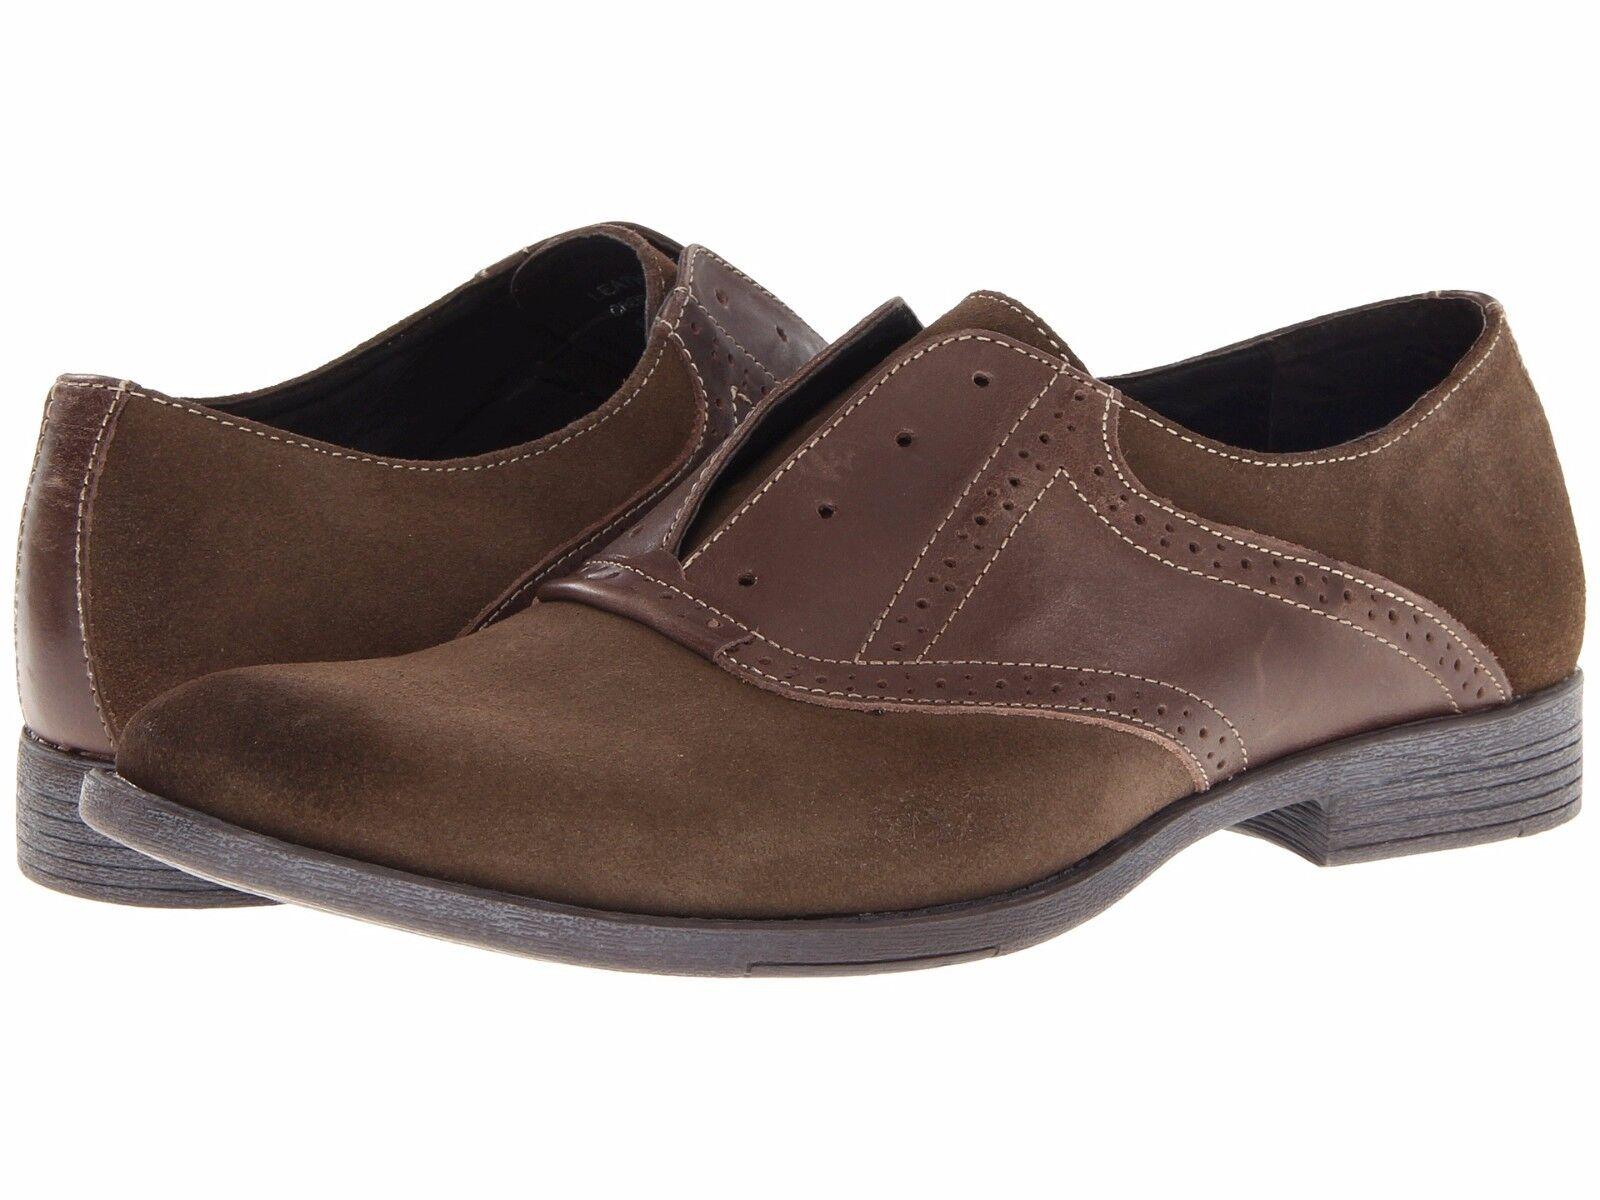 New RW by Robert Wayne Creid men's shoes size 12D